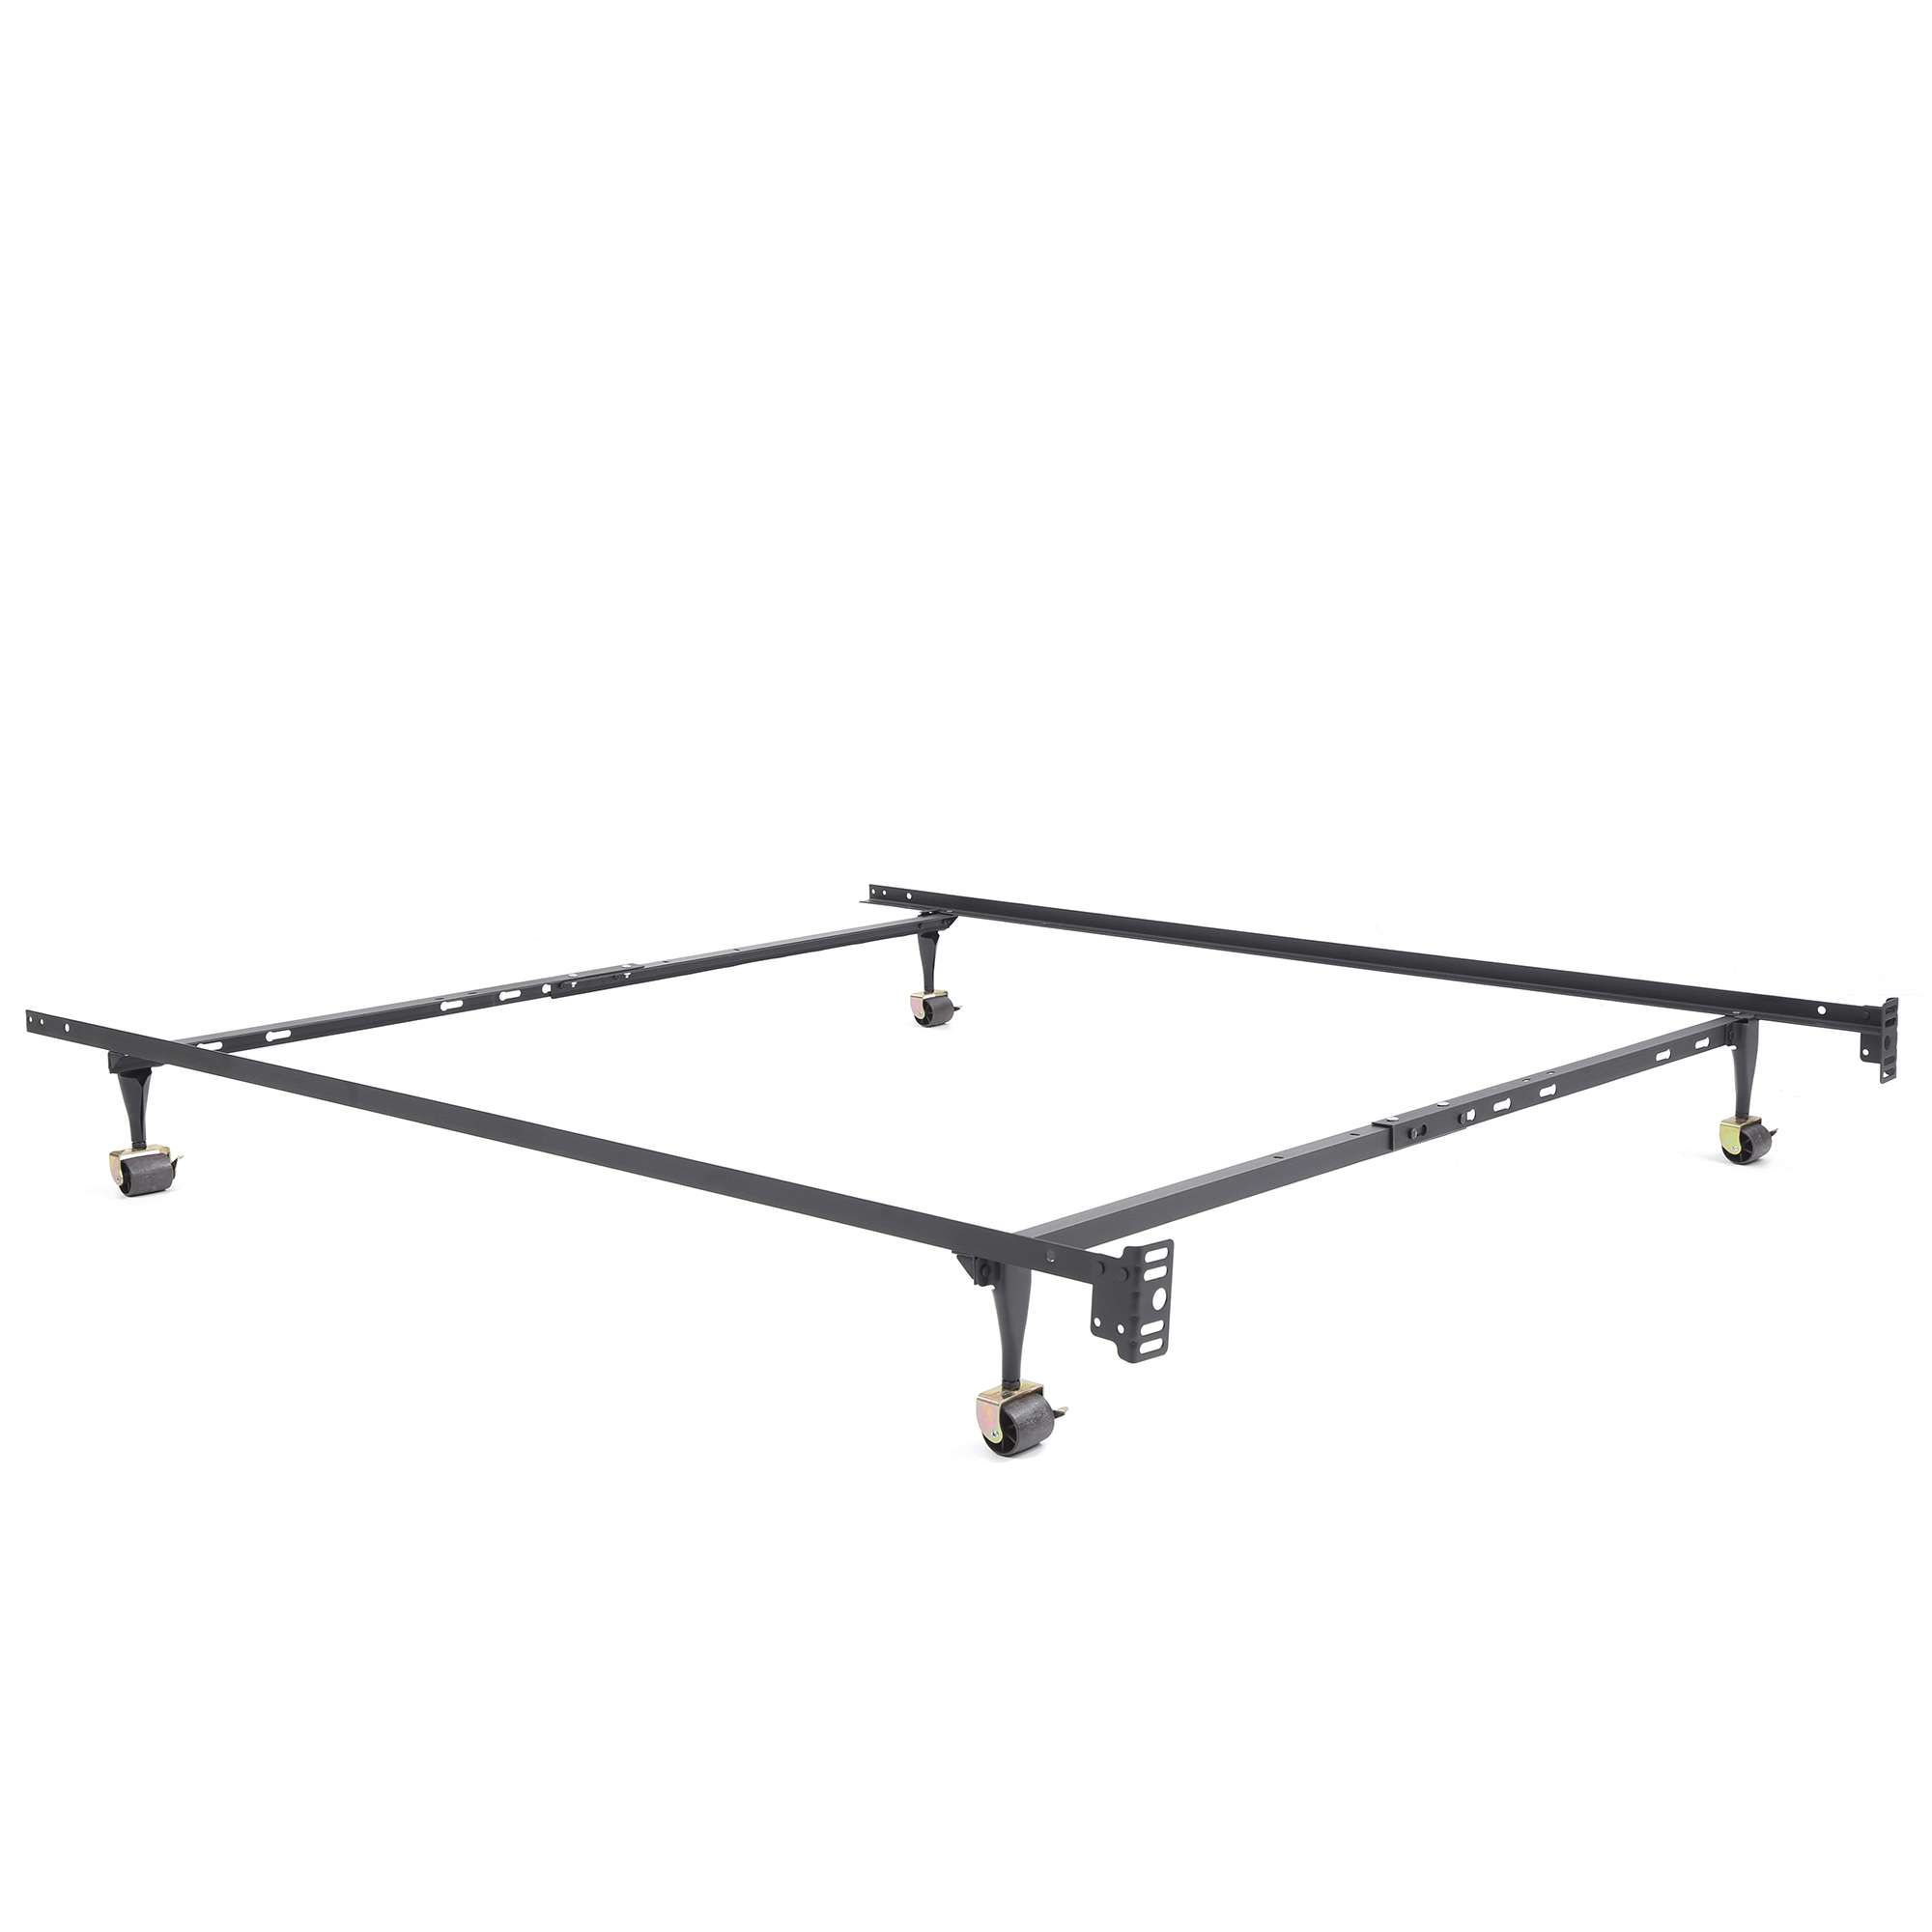 Modern Sleep Standard Adjustable Metal Bed Frame, Multiple Sizes